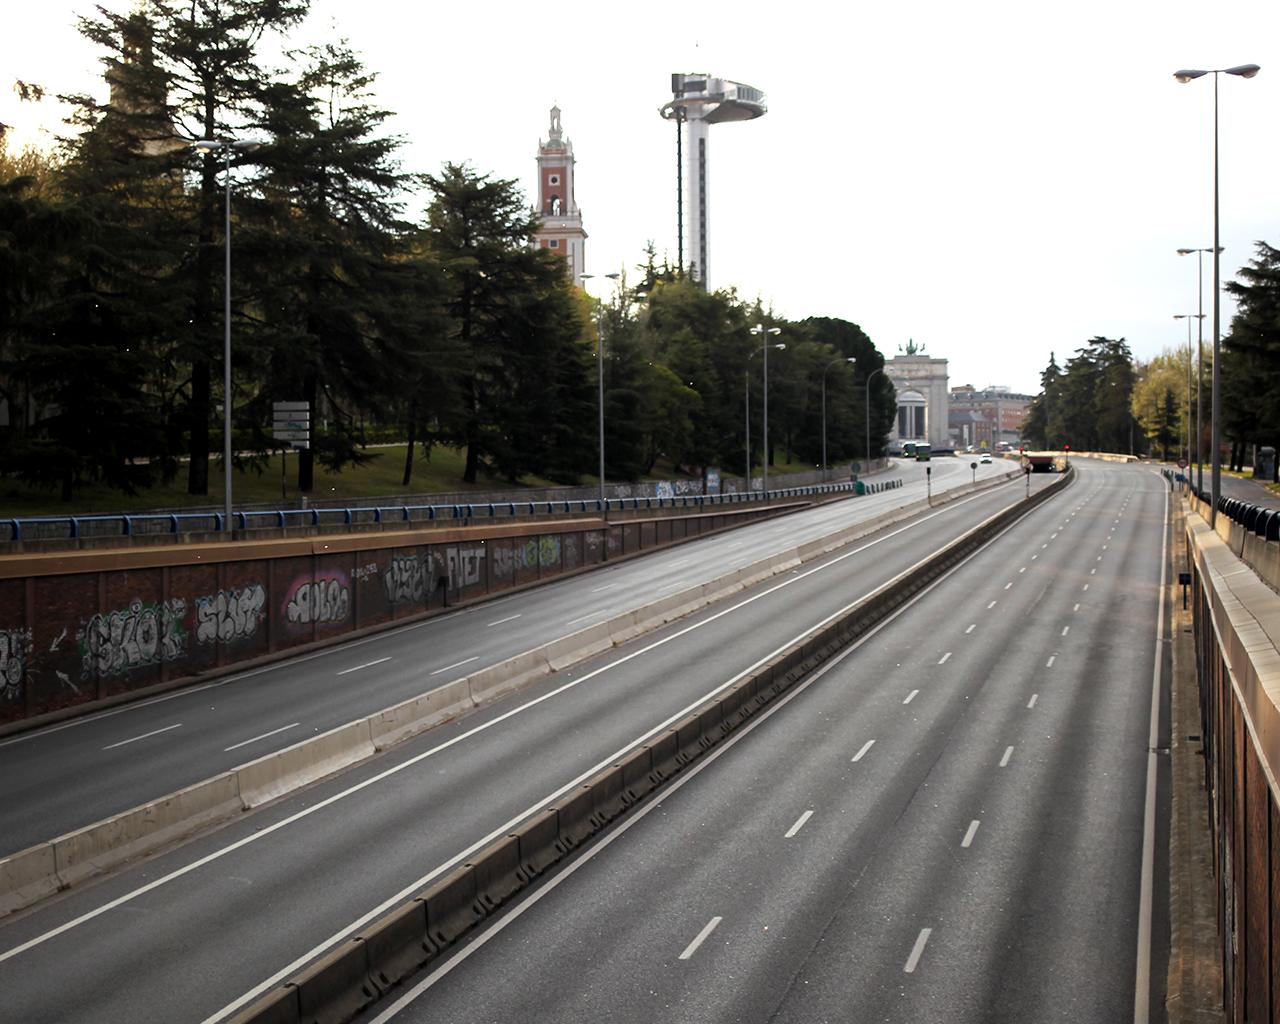 Accesos a Madrid desde la A6, a primera hora de la mañana. Madrid. 30/03/2020.